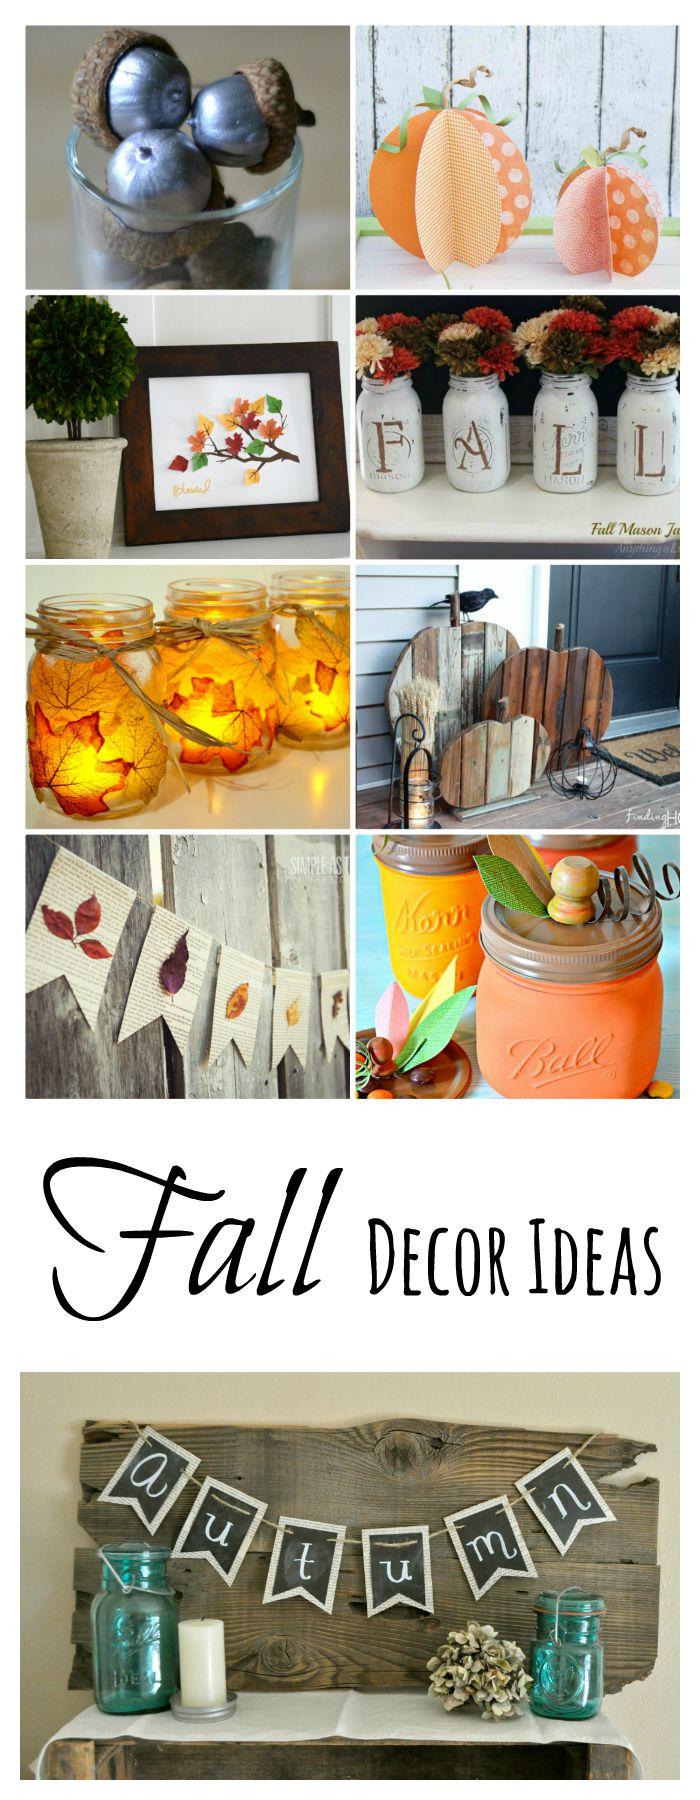 Fall-Decor-Ideas-Pinterest